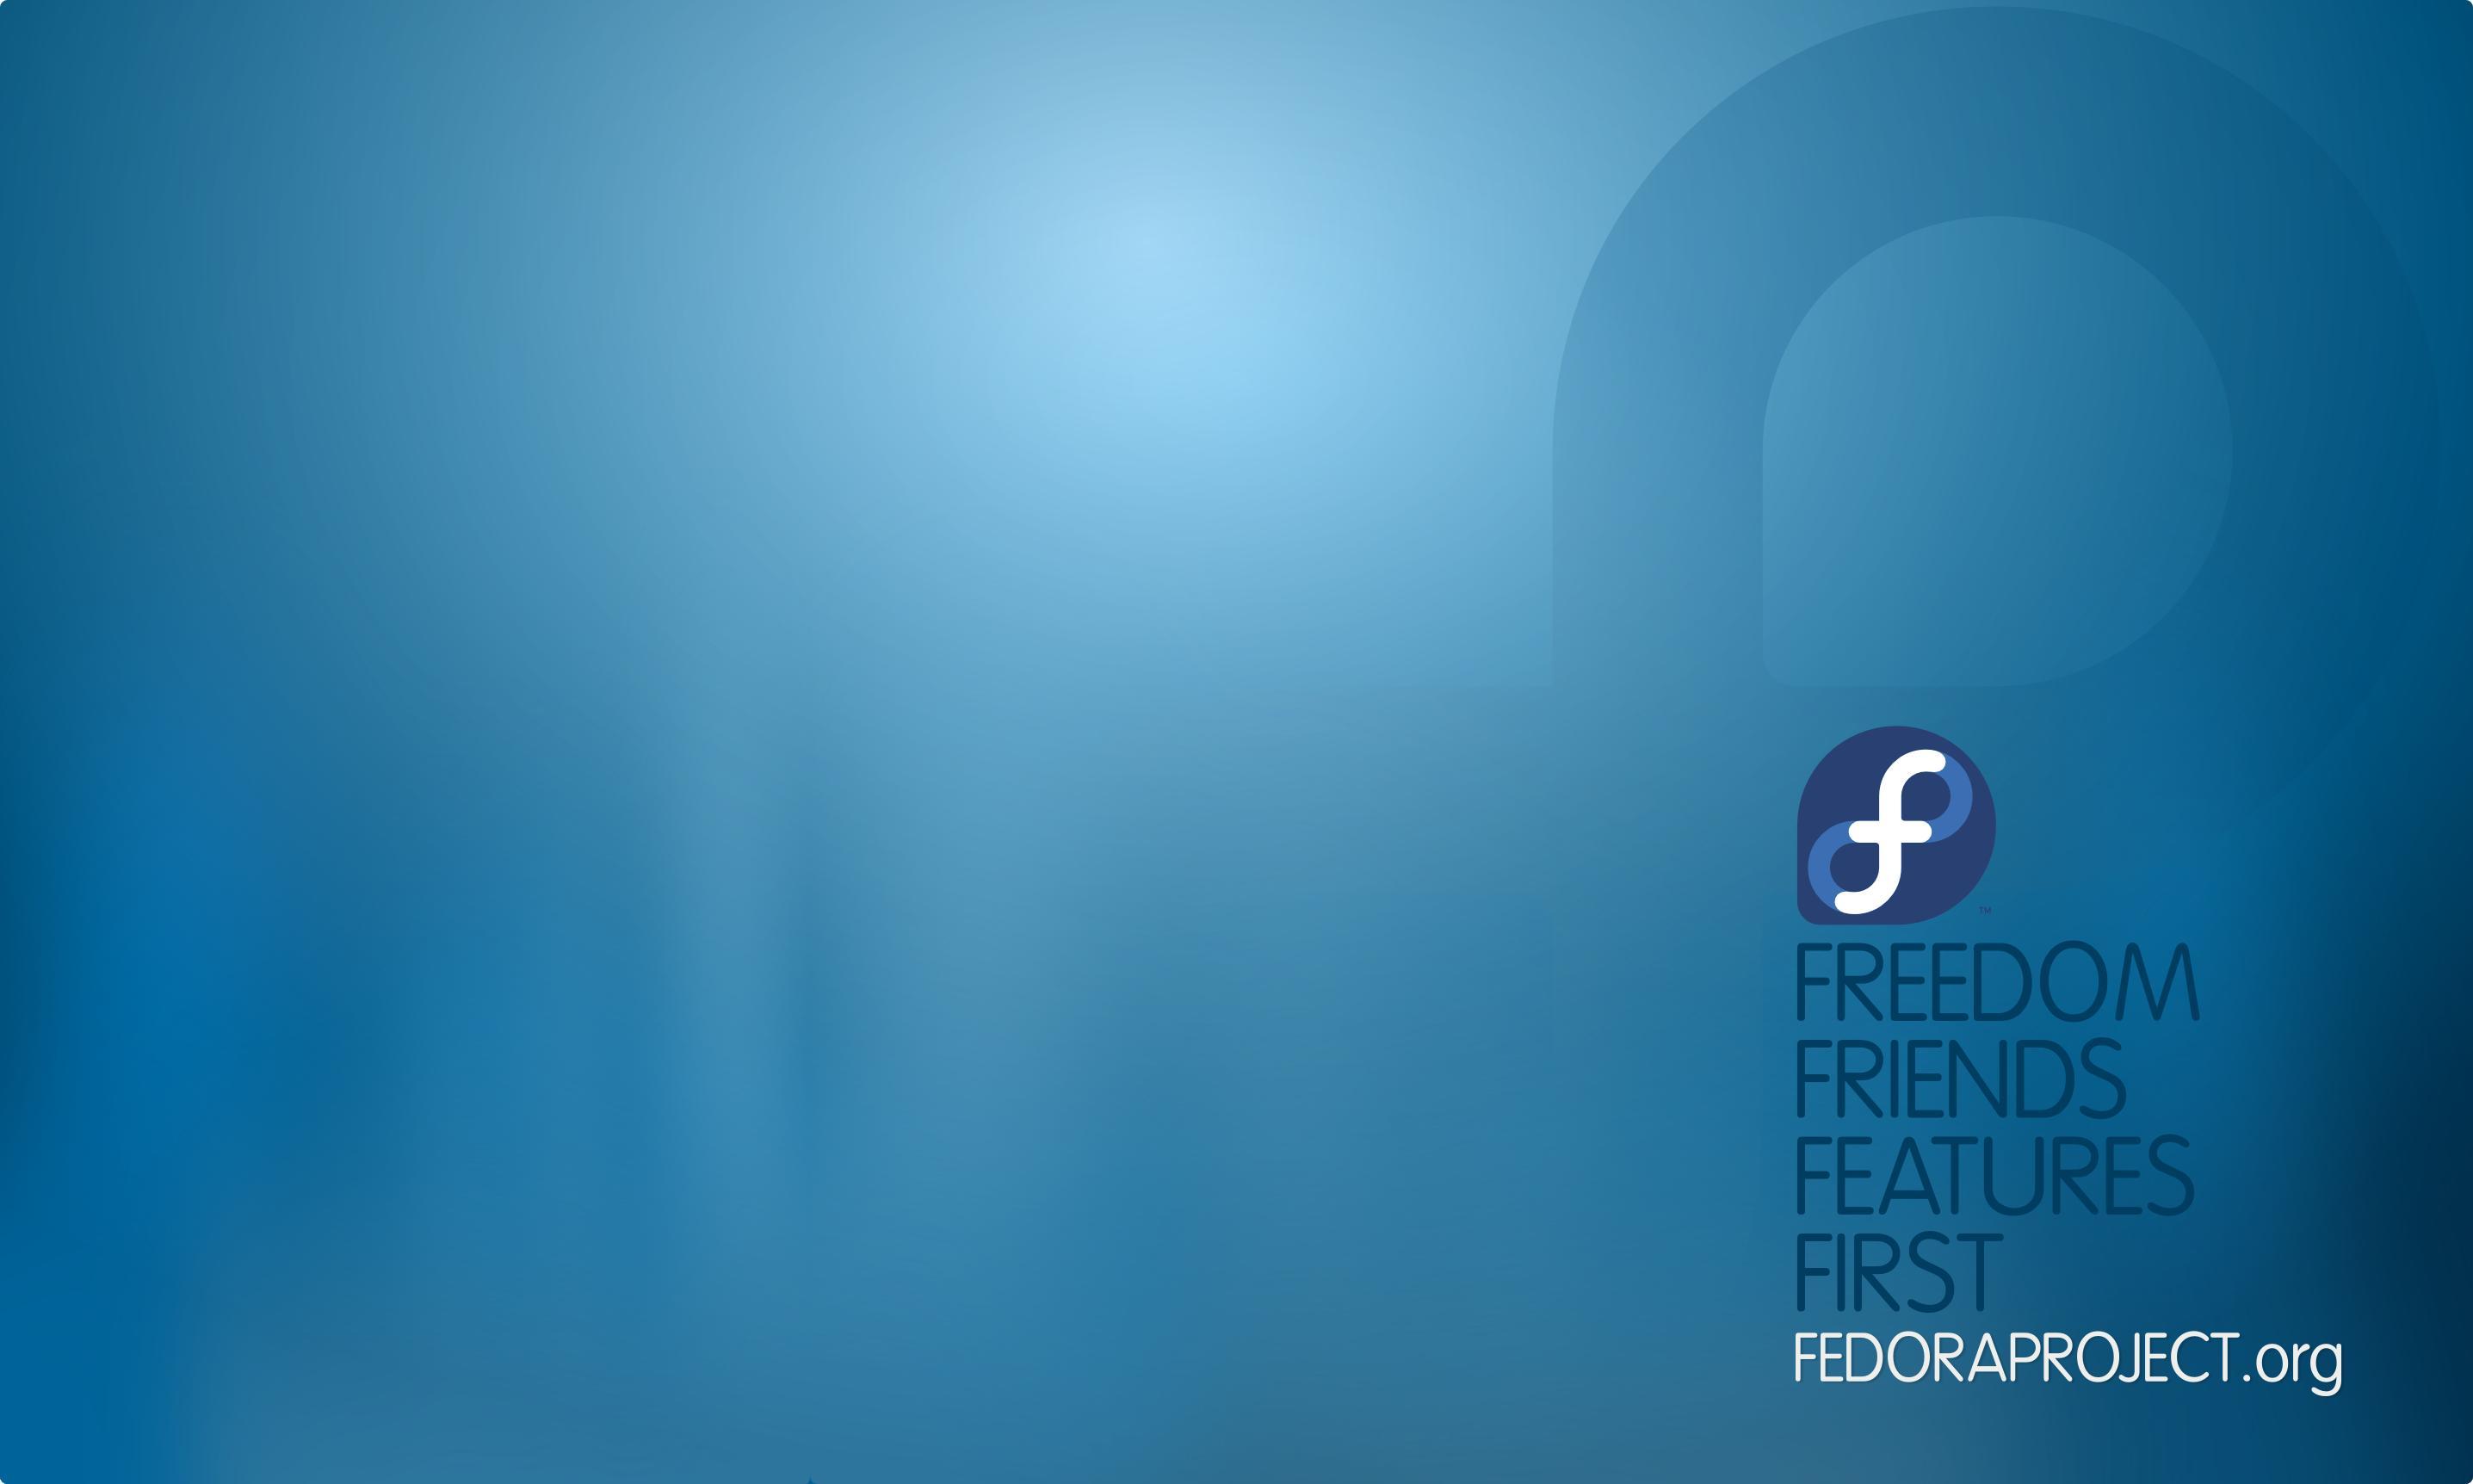 linux fedora wallpaper - photo #6